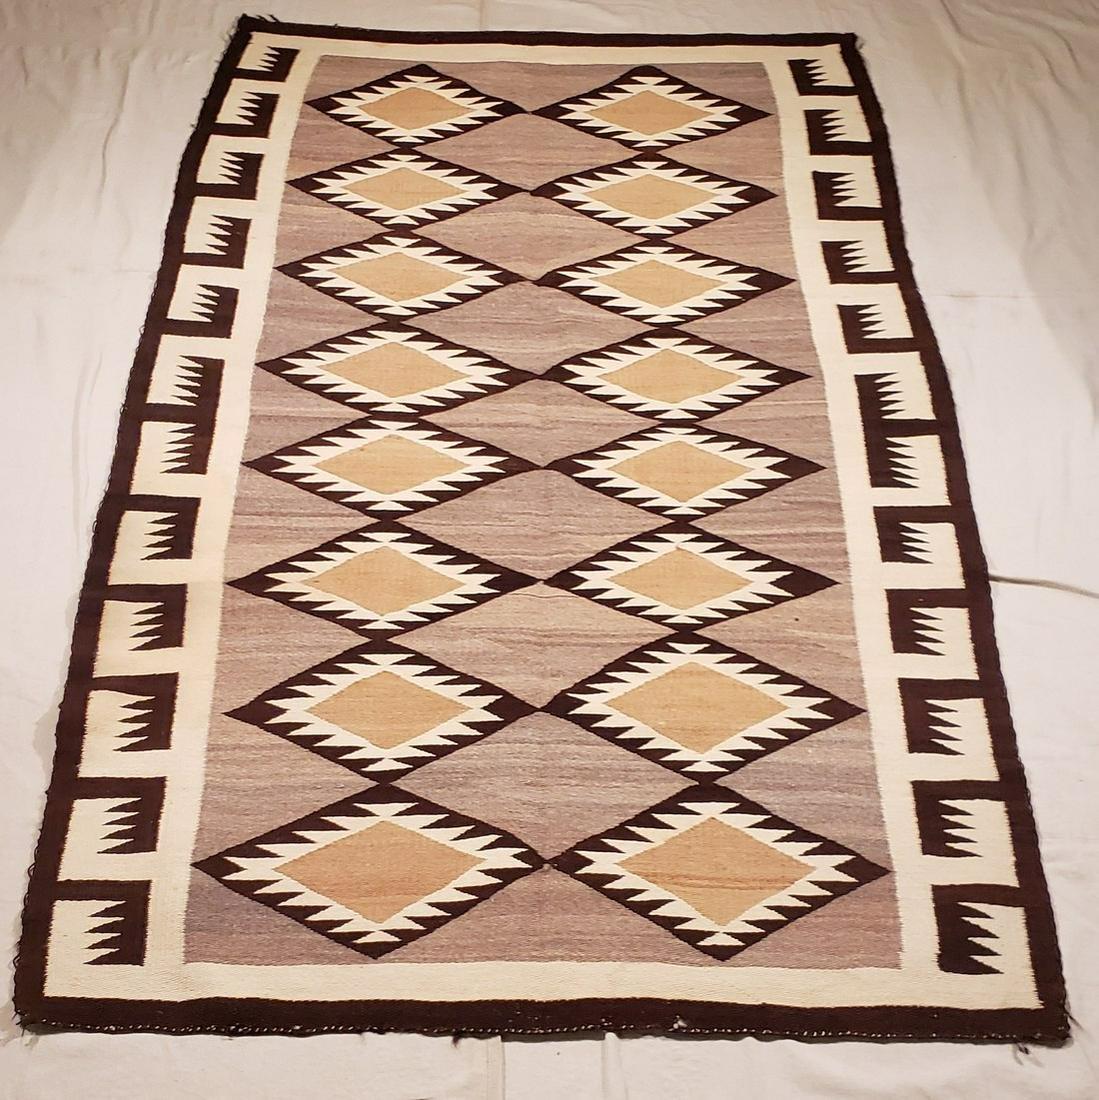 Large Navajo Woven Rug Ca 1940's